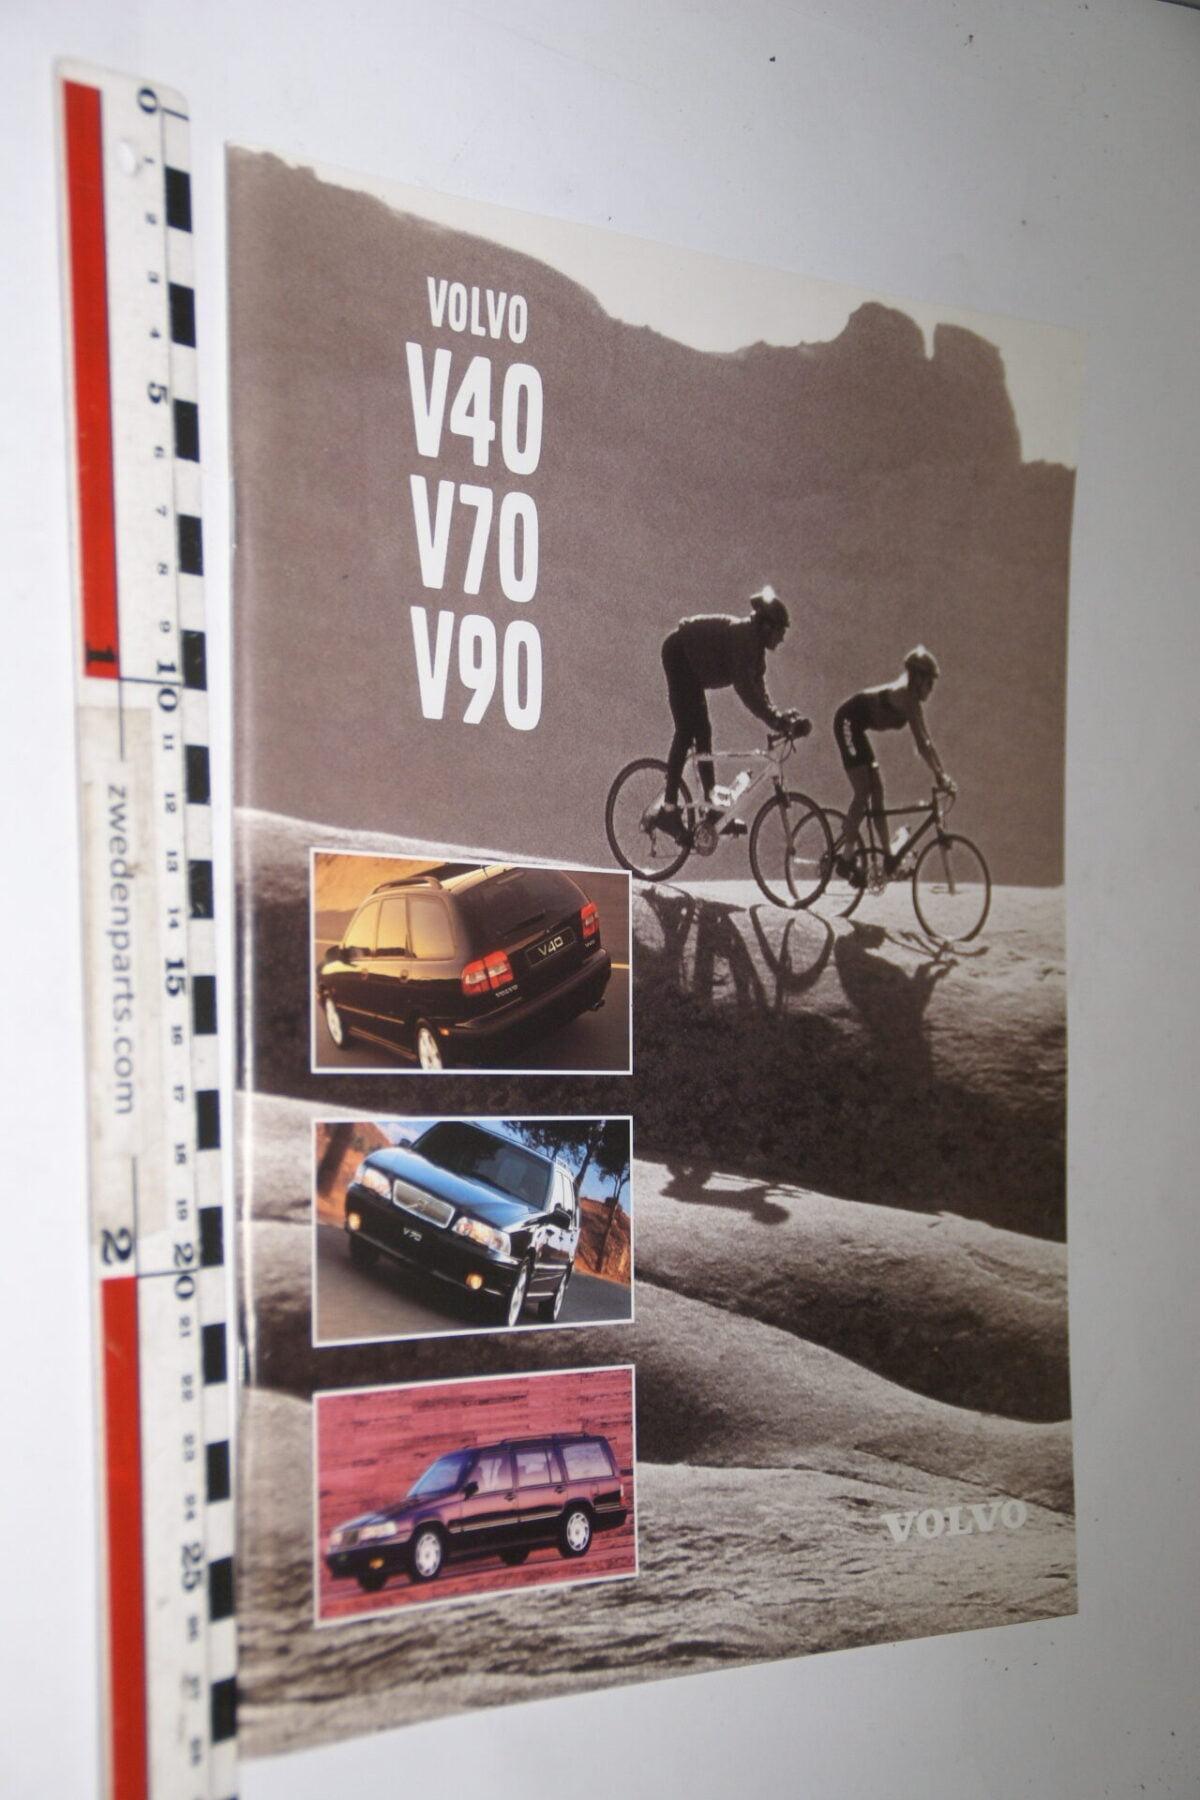 DSC04995 1997 originele brochure nr. C0897 Volvo V40 V70 V90-fef8bb6f